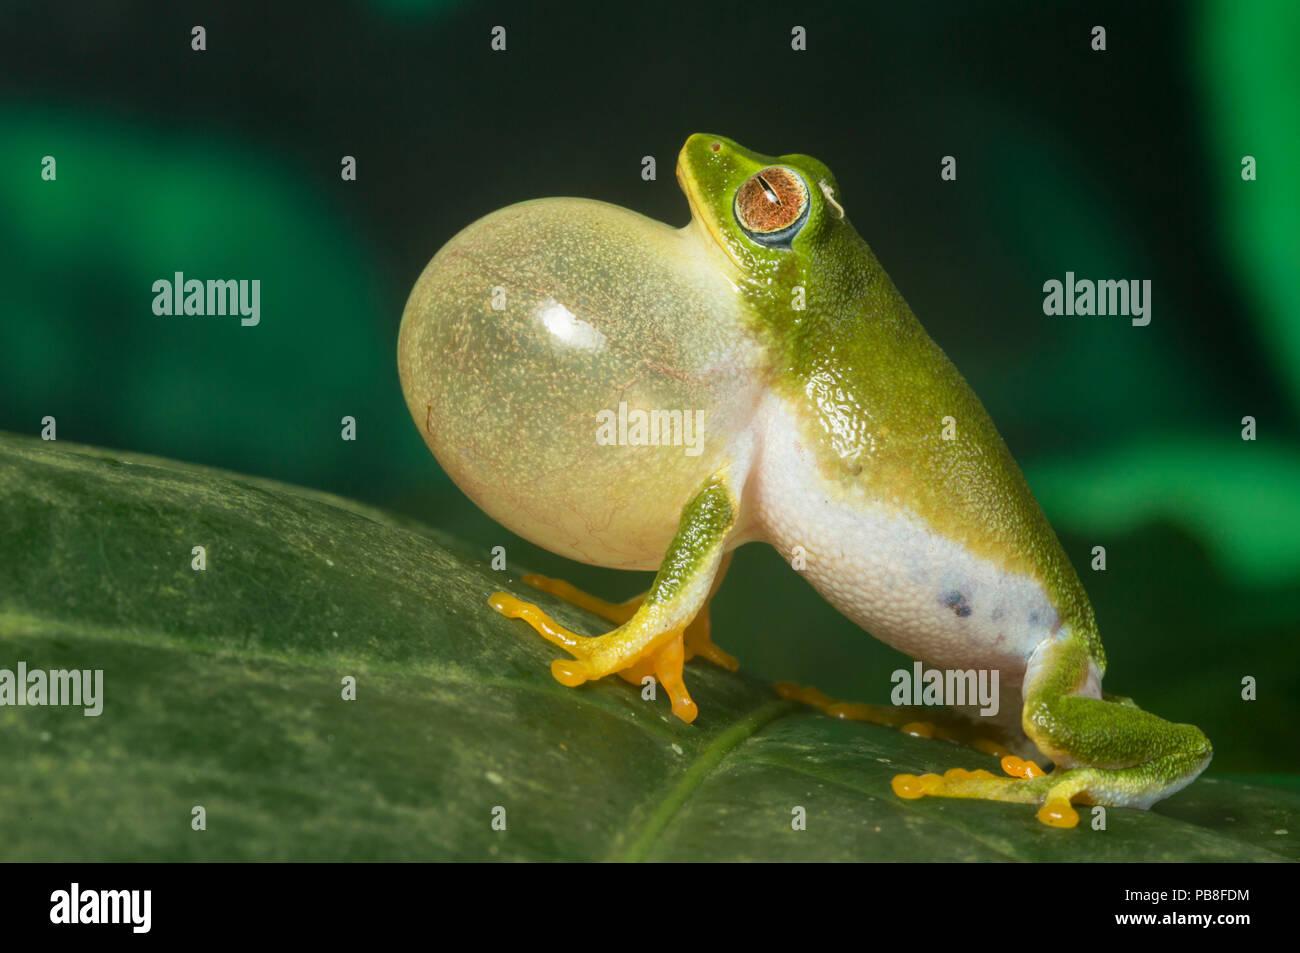 Jayarami Bush frog (Raorchestes jayarami), inflating vocal sac, calling to attract mate, Anamalai Wildlife Sanctuary, India. Endemic to Western Ghats. - Stock Image